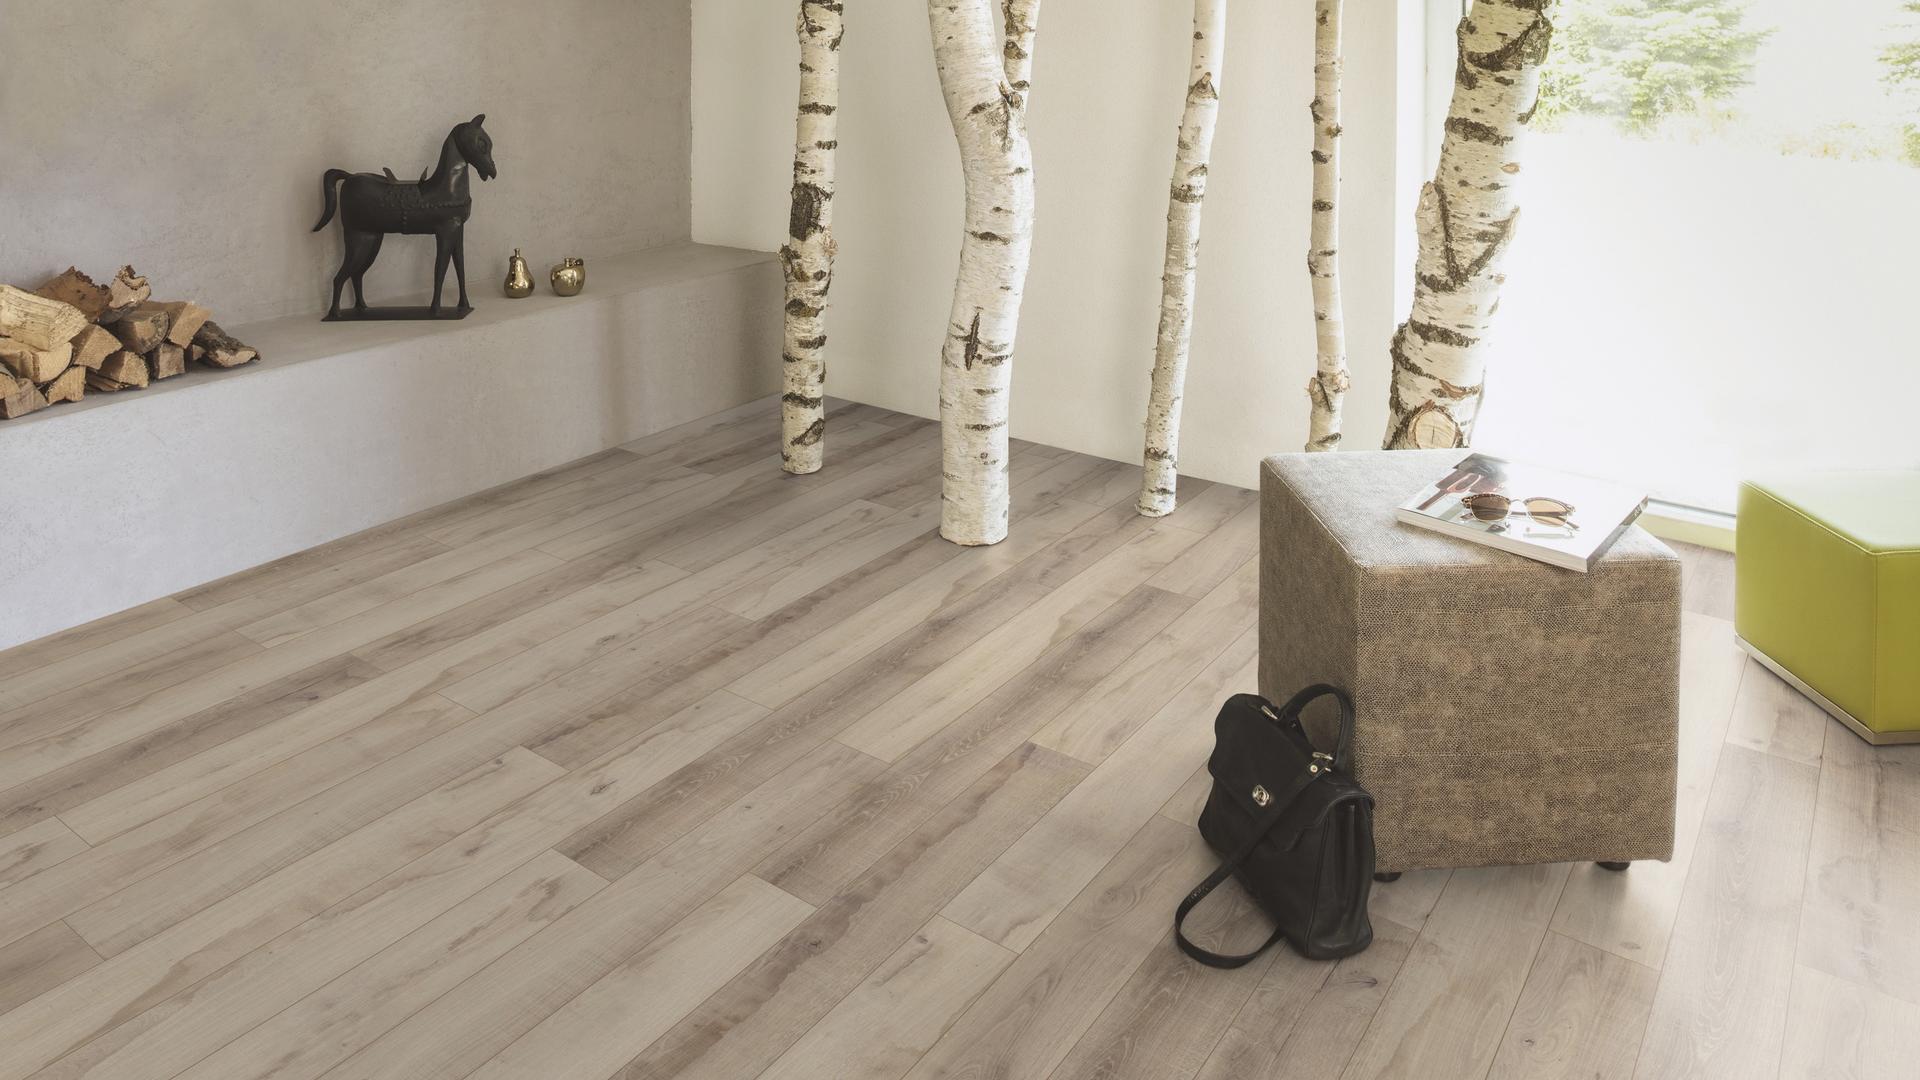 Raumaufnahme Wohnzimmer Laminatboden Classic Touch K4429 Eiche Native Sand VS